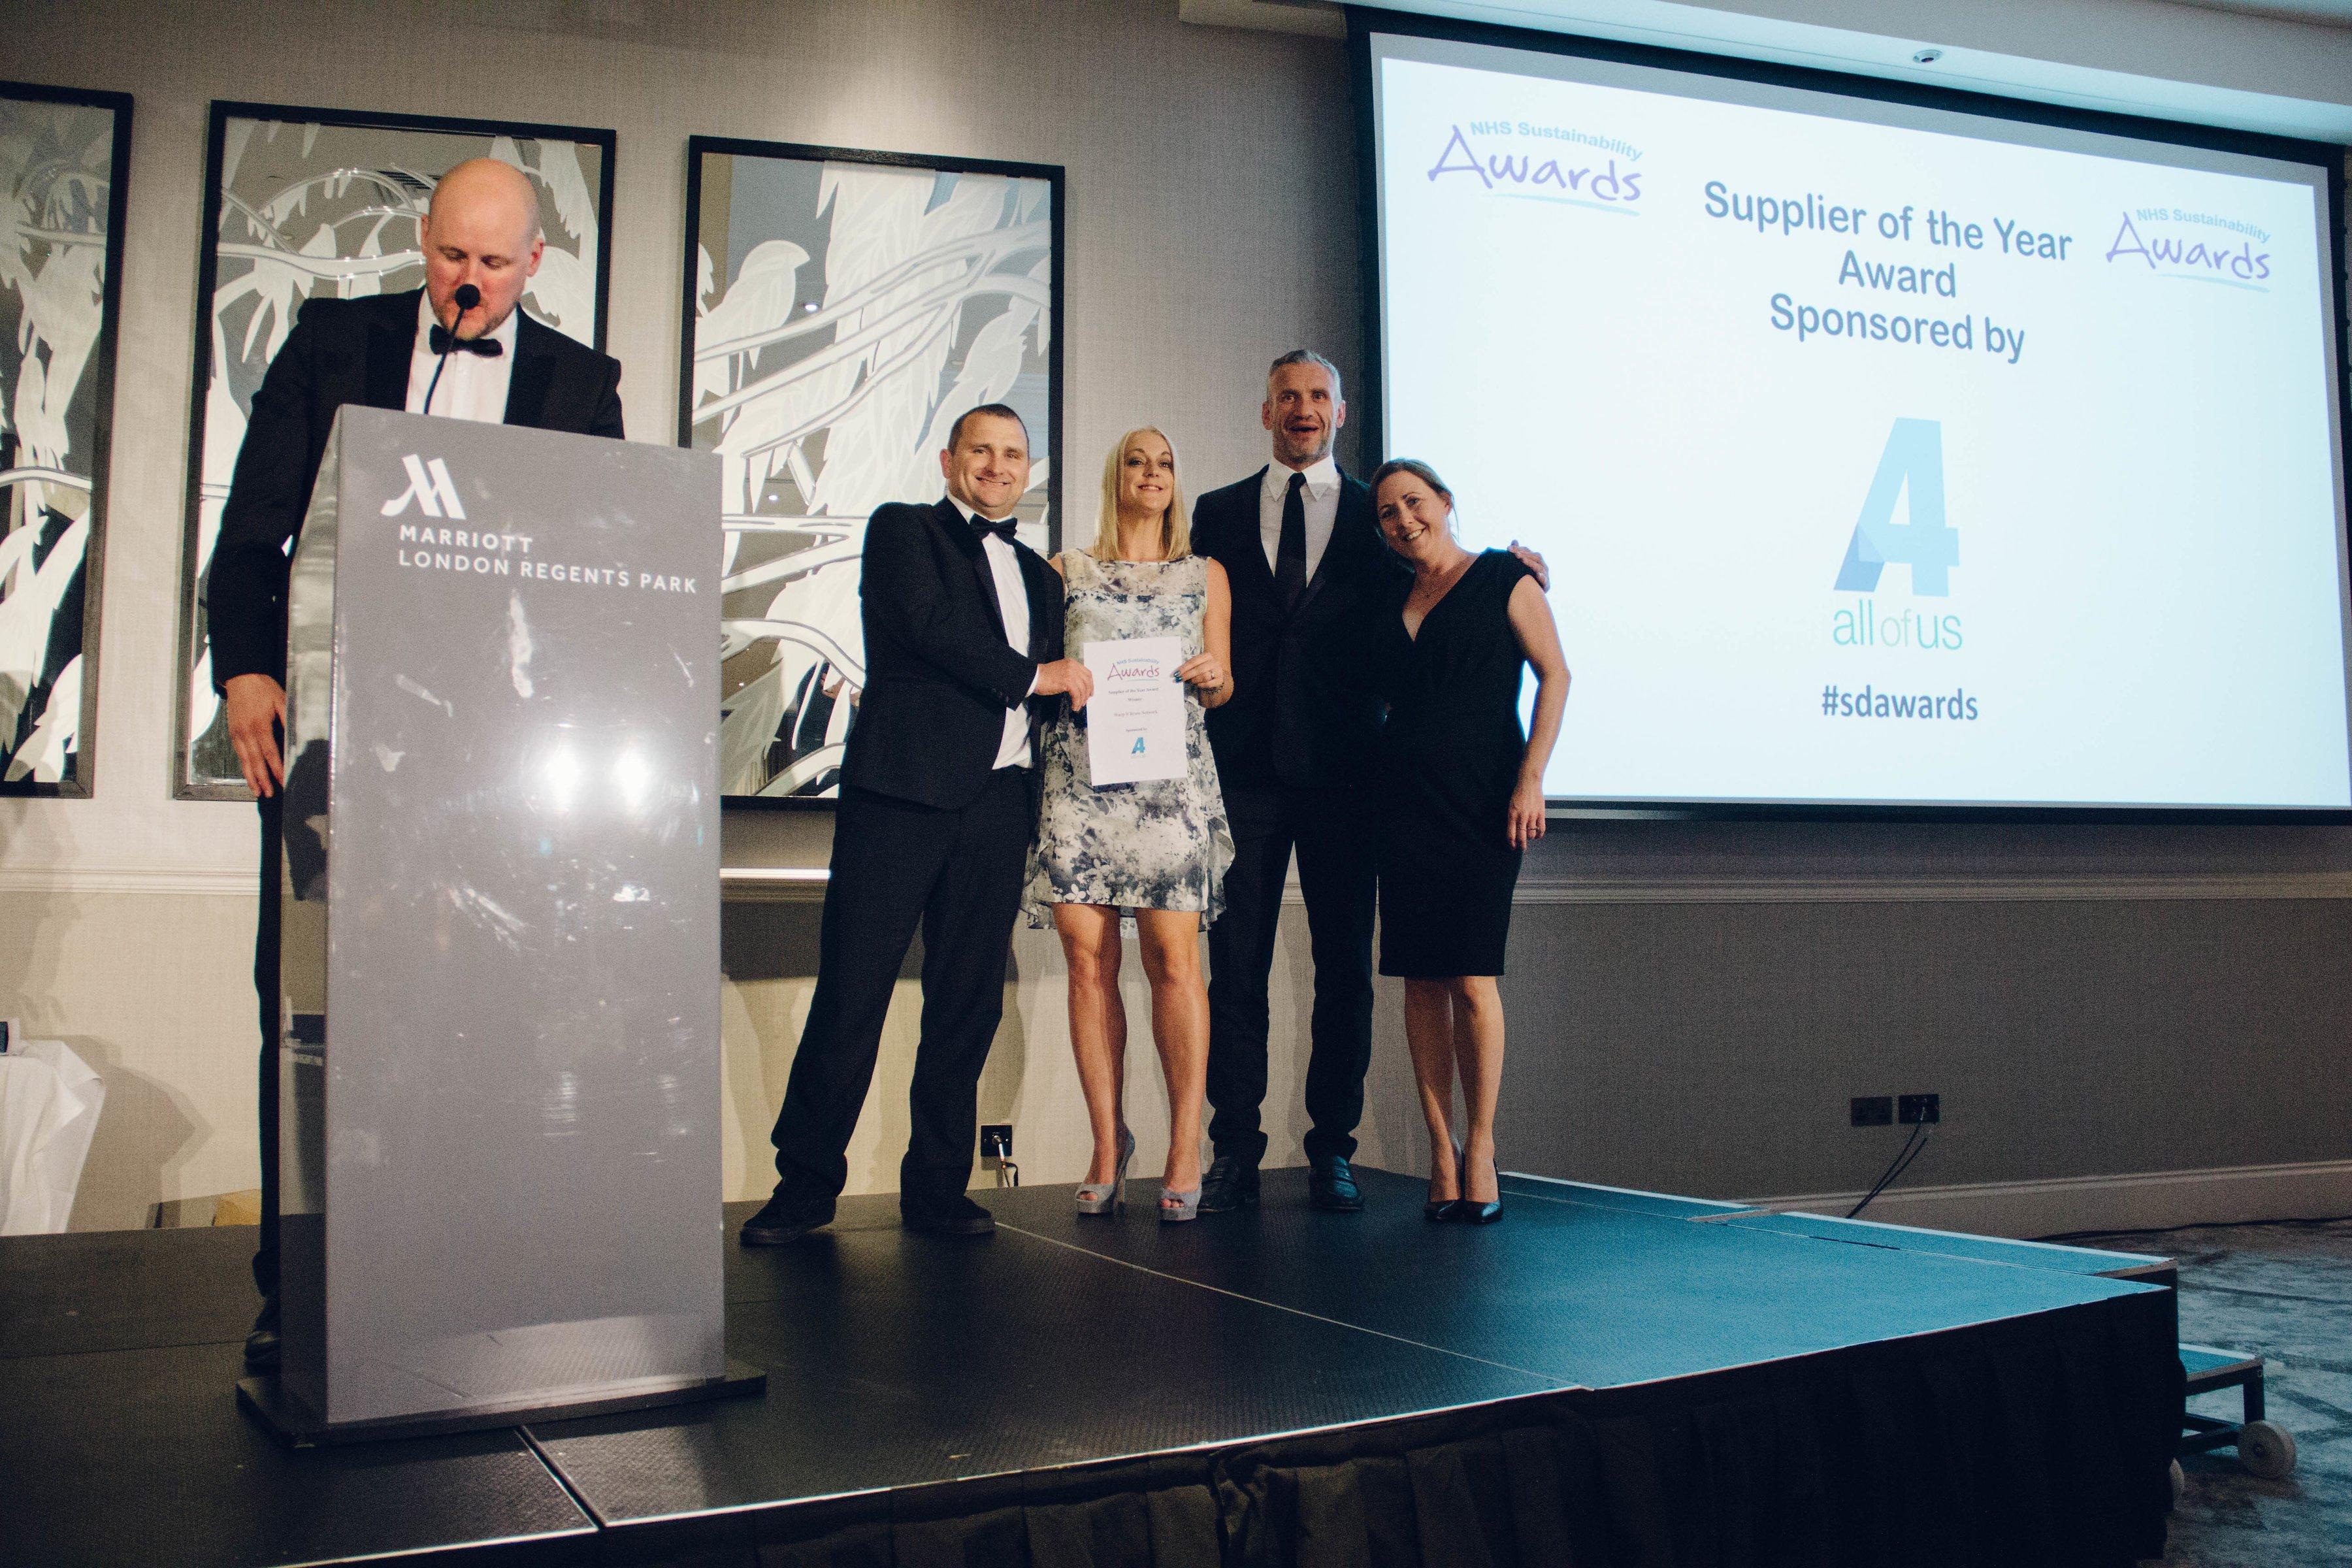 NHS awards supplier of year warp it